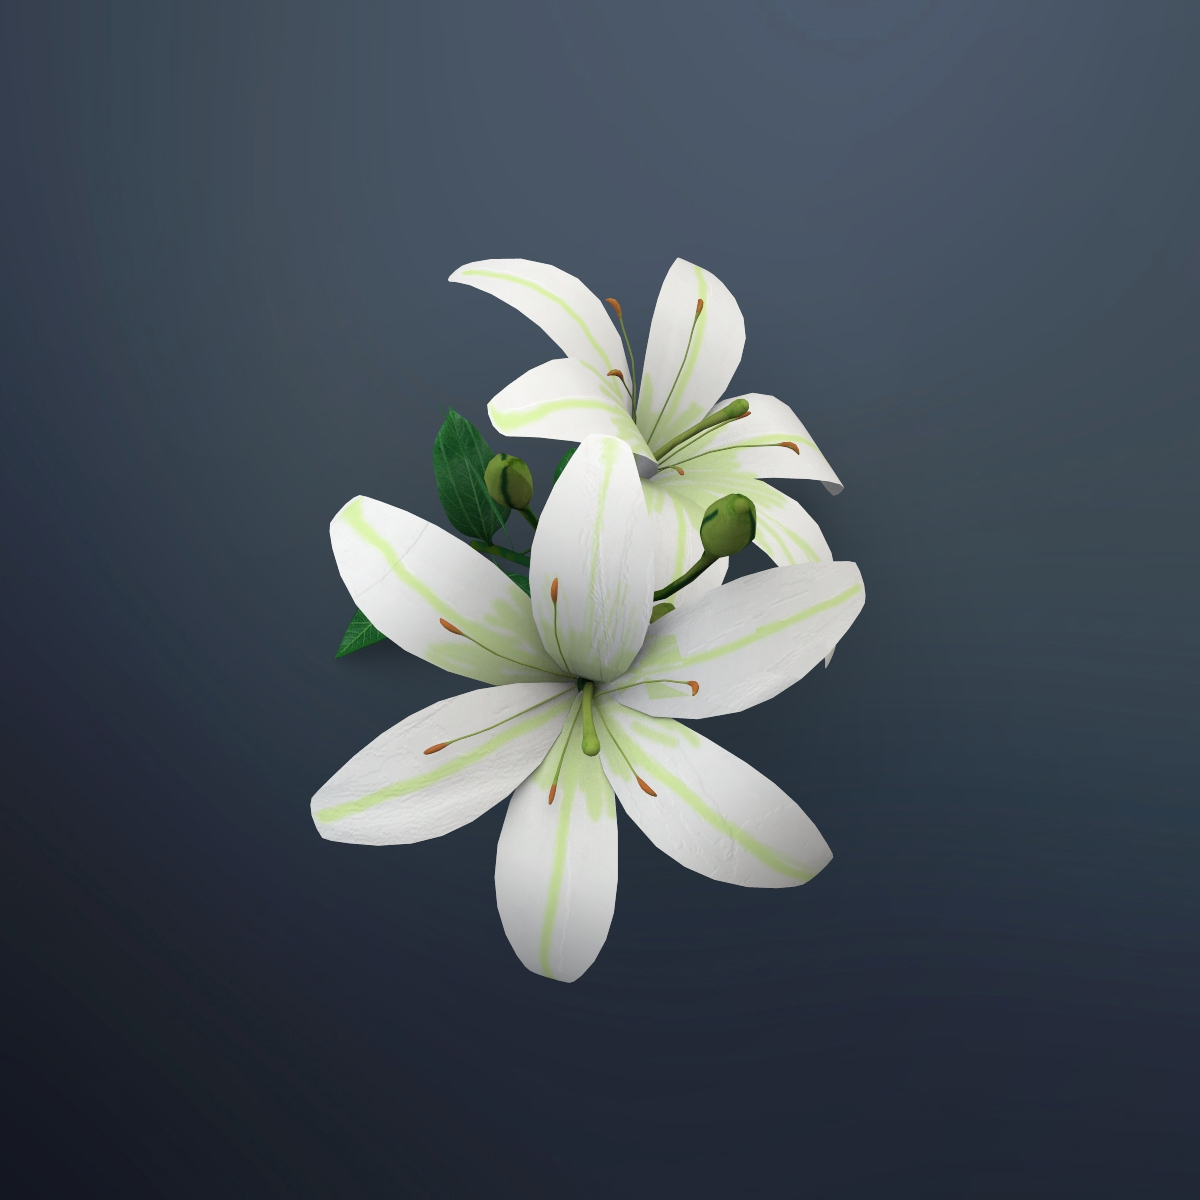 Lily Flower By Deepocean3d 3docean